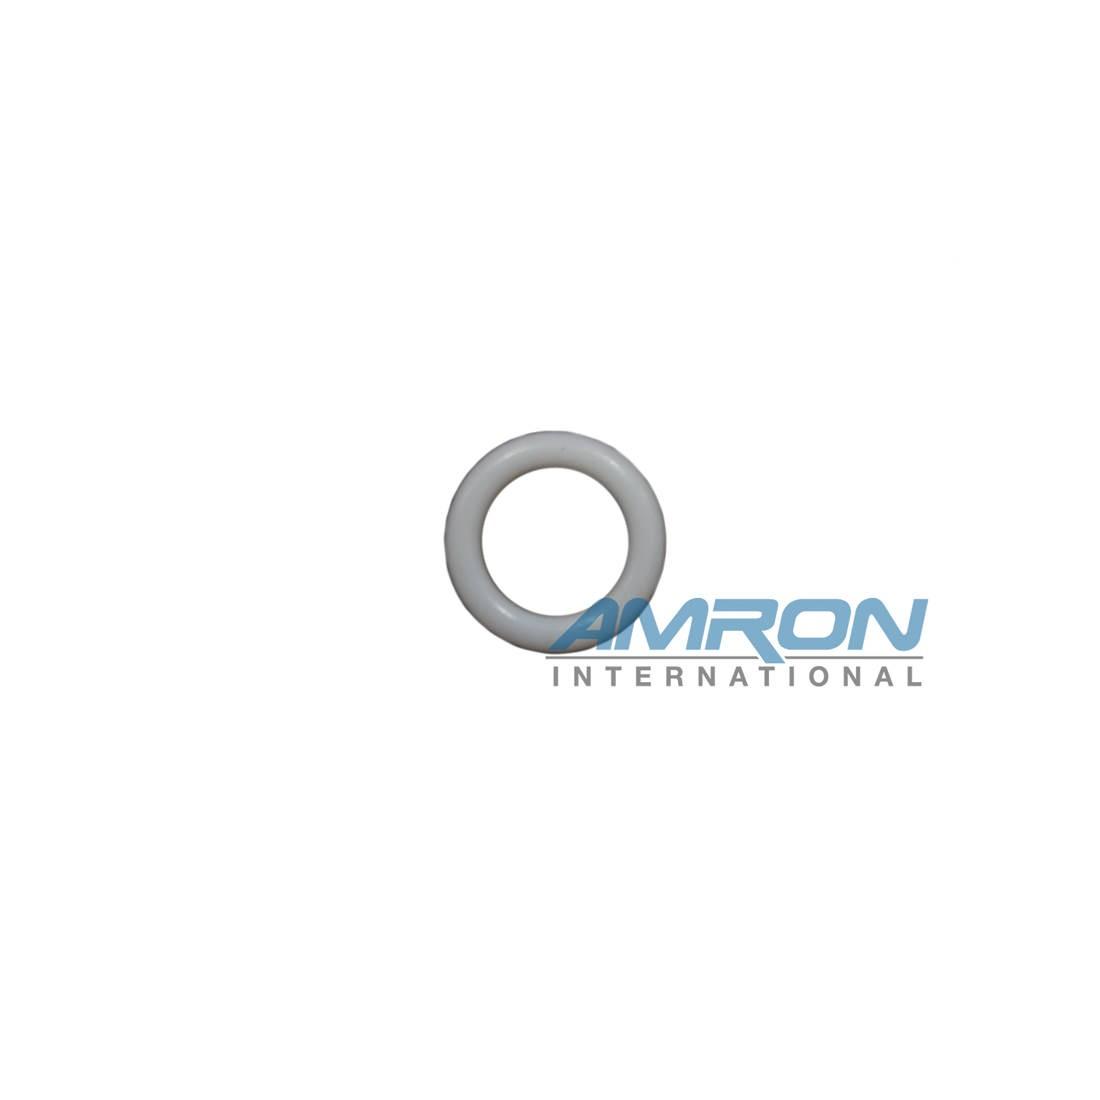 Kirby Morgan 520-033 Teflon O-Ring